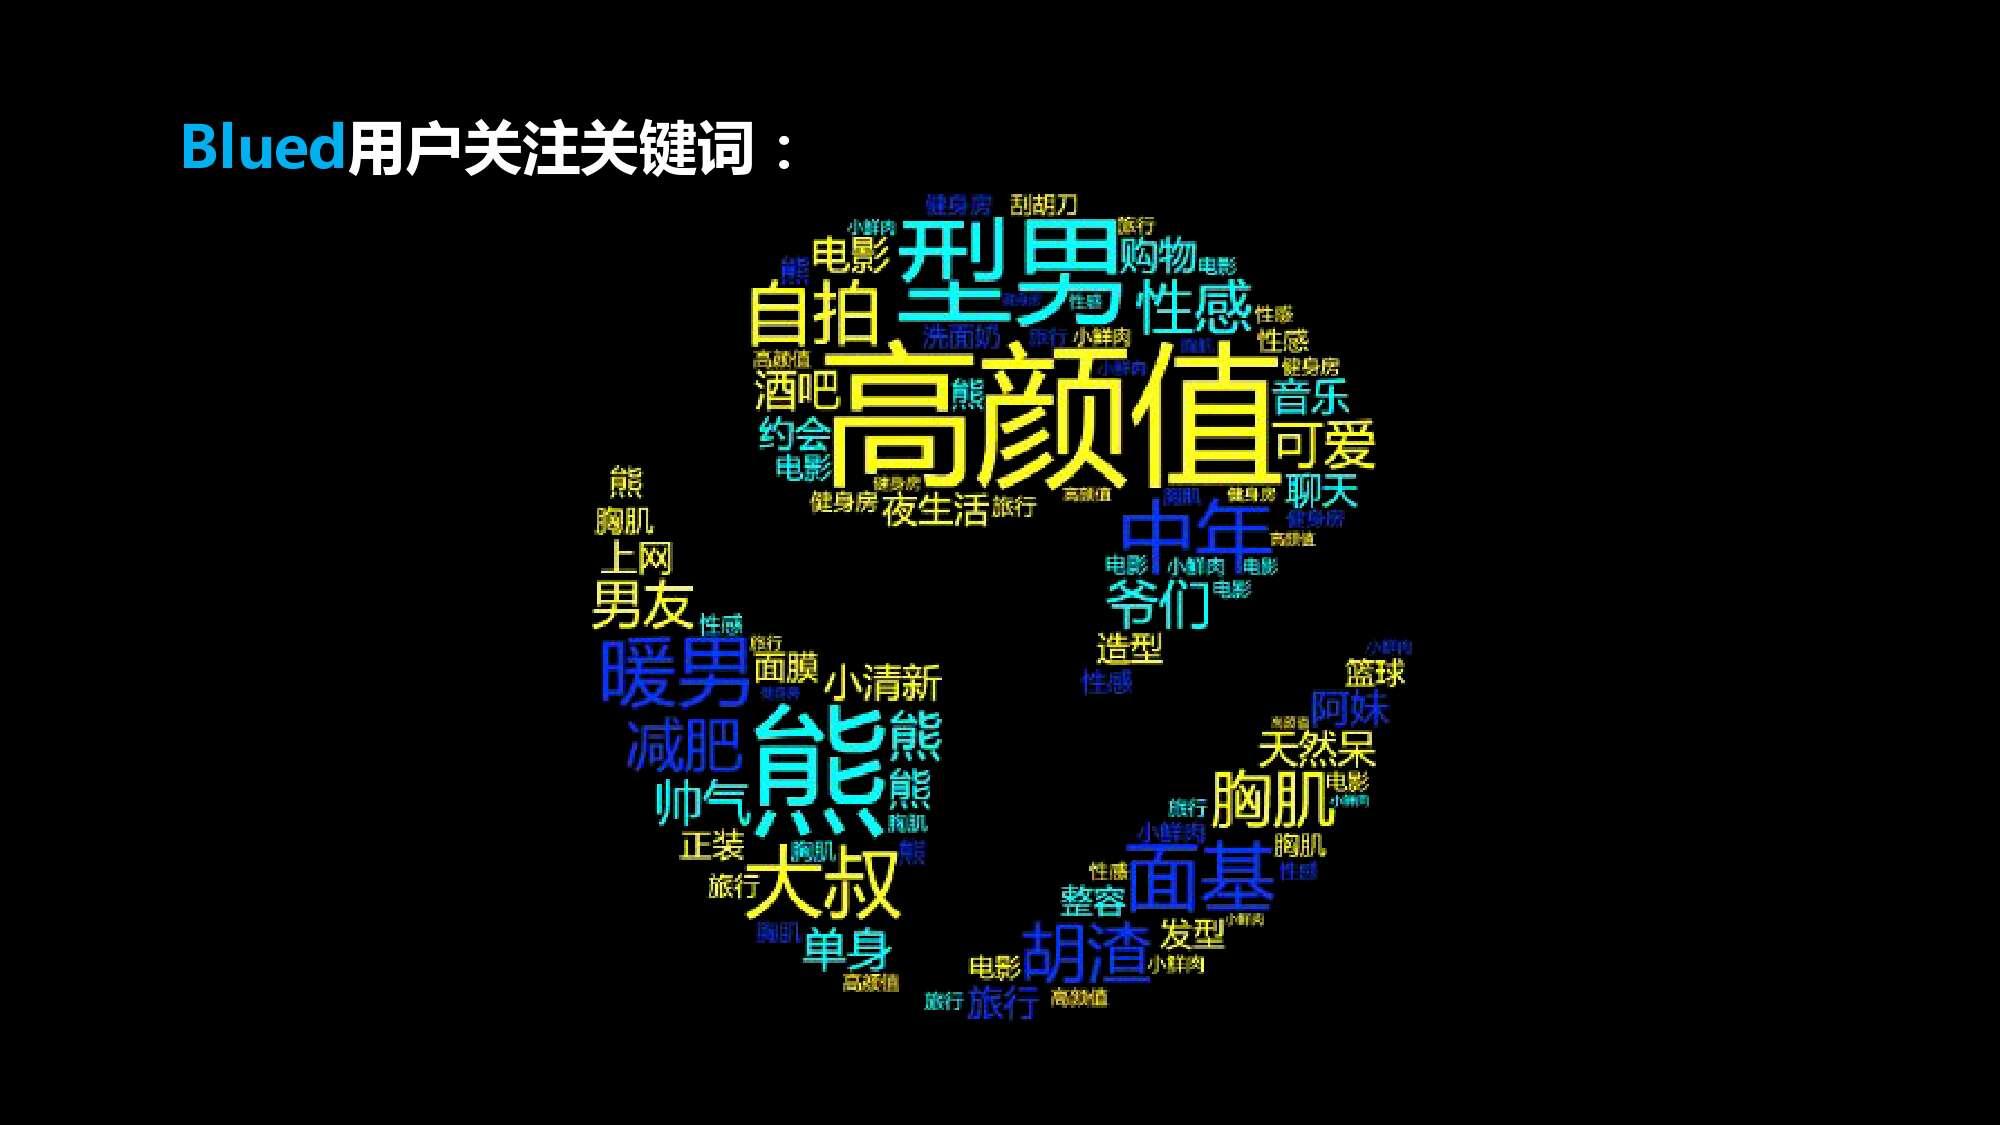 Blued2015中国同志社群大数据白皮书_000017